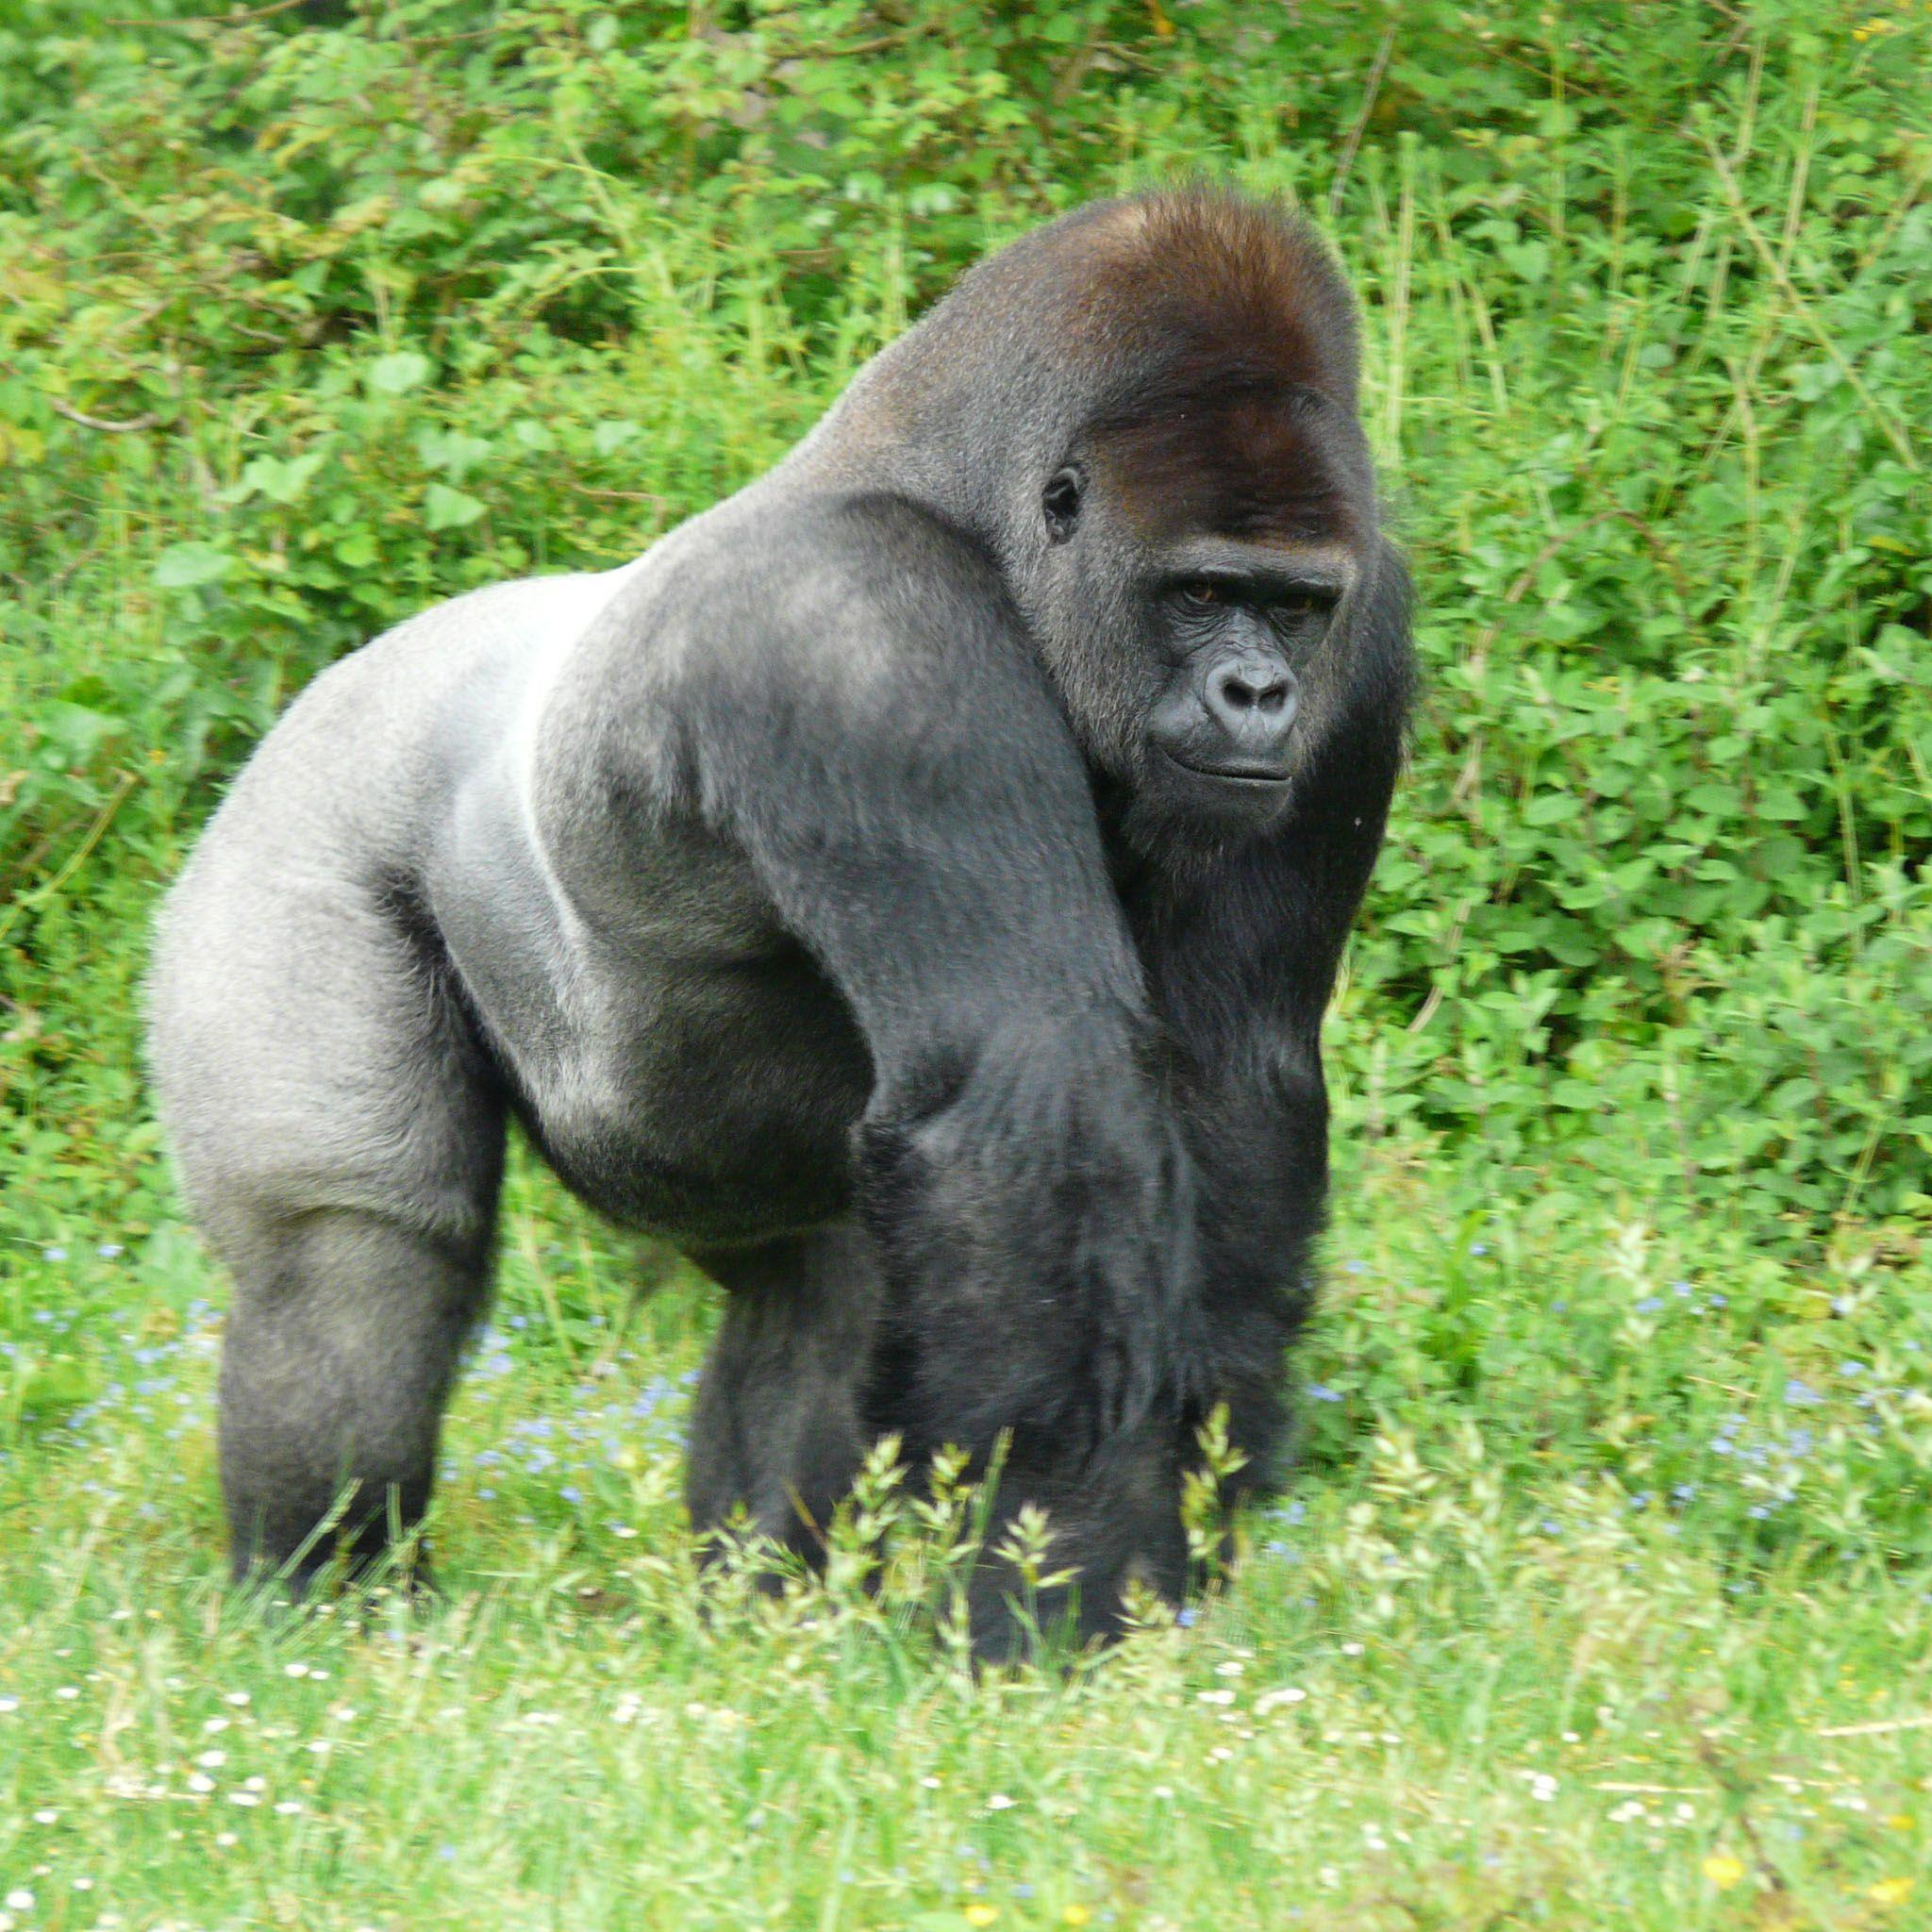 PICTURES OF SILVERBACK GORILLIAS | Proud Silverback Gorilla 2048 x ...